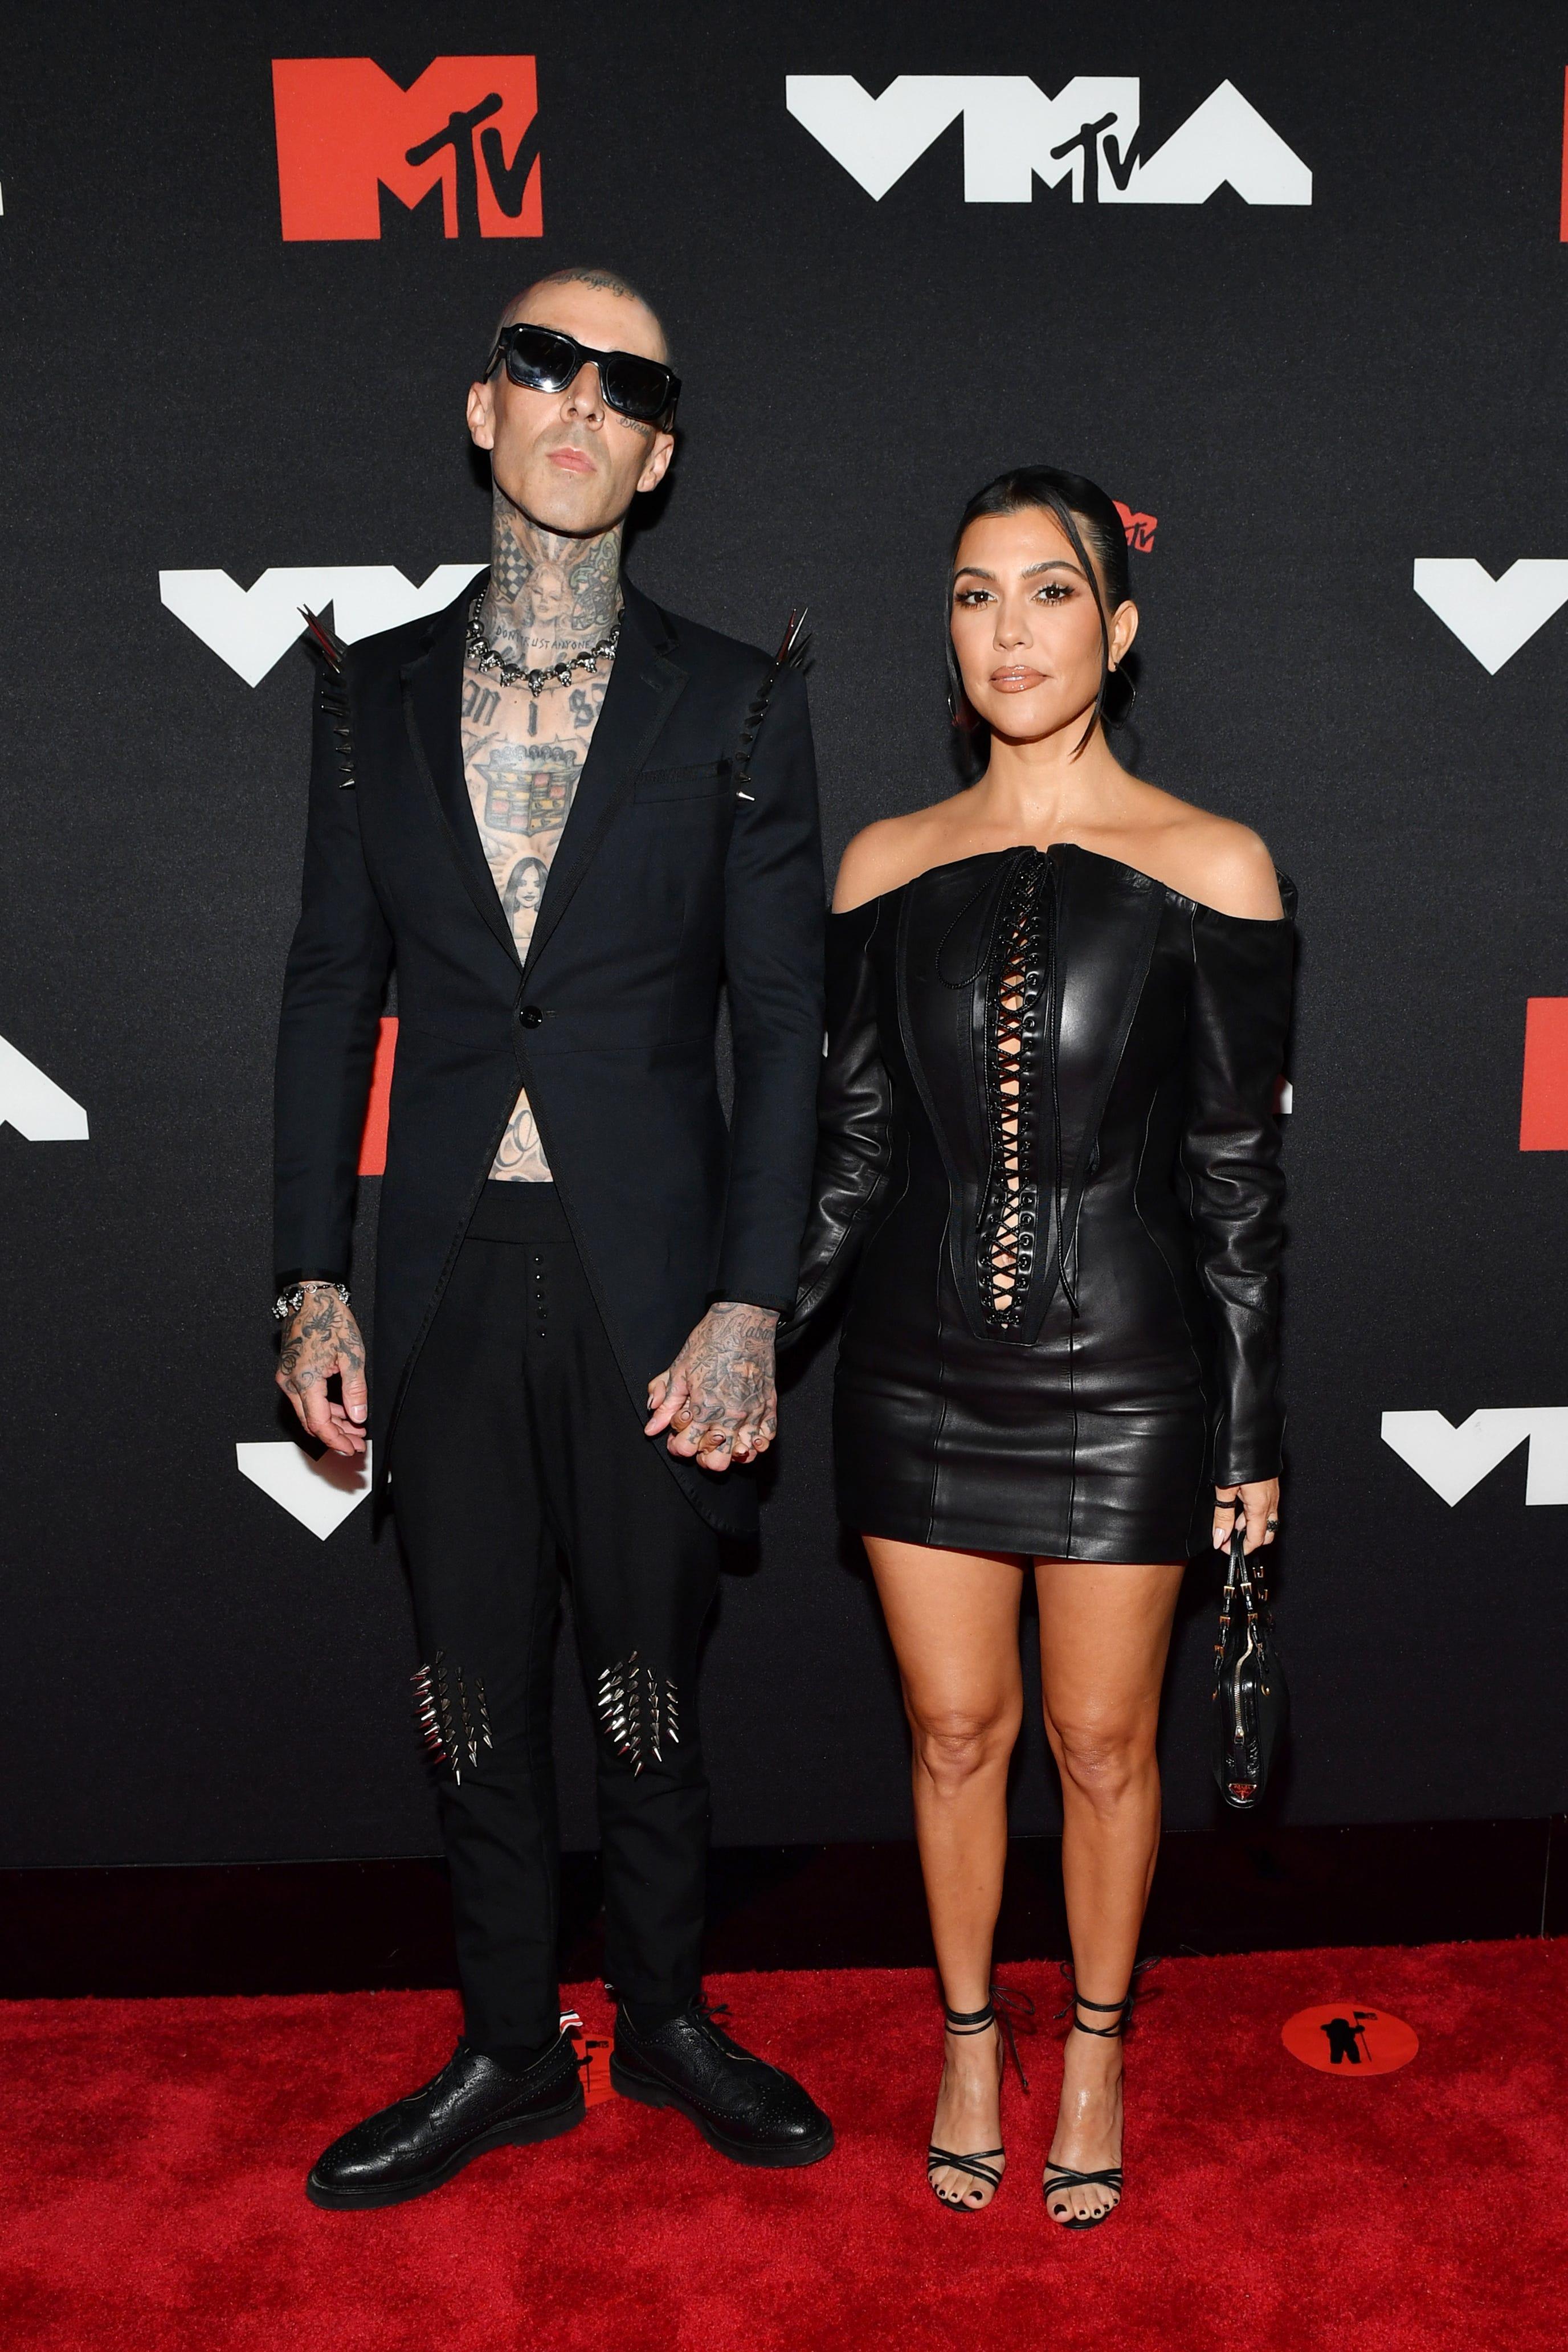 It was a dream : Kourtney Kardashian reminisces on beachside engagement to Travis Barker